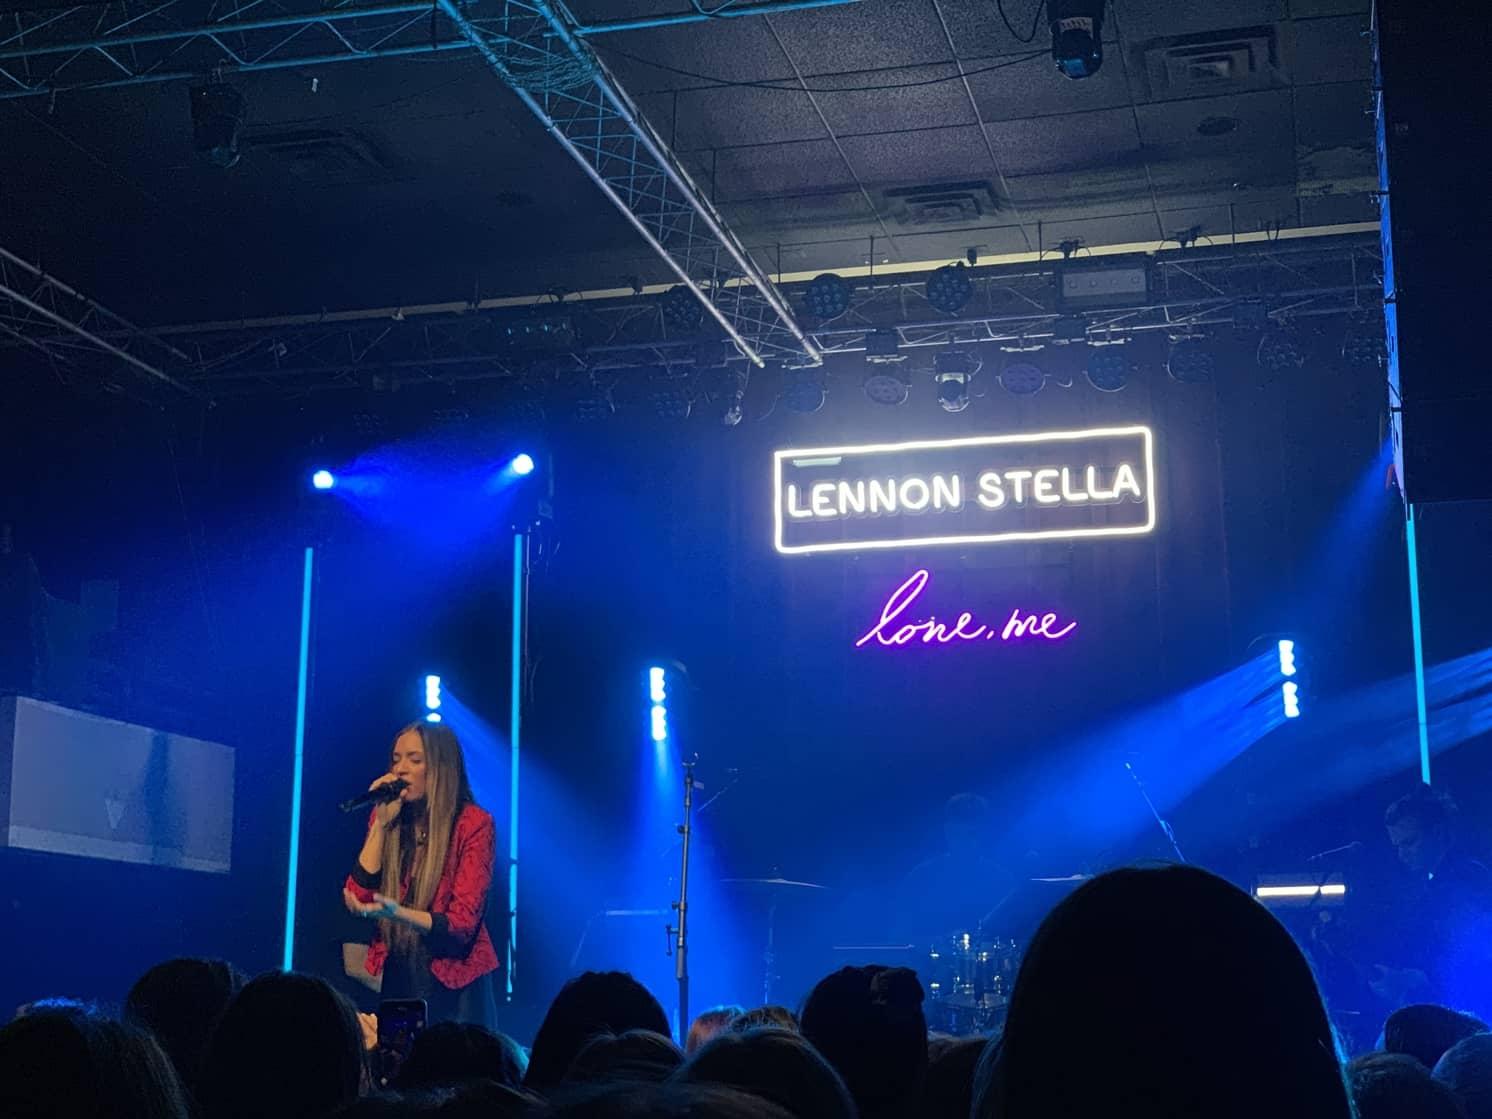 Lennon Stella 3/30 Fine Line